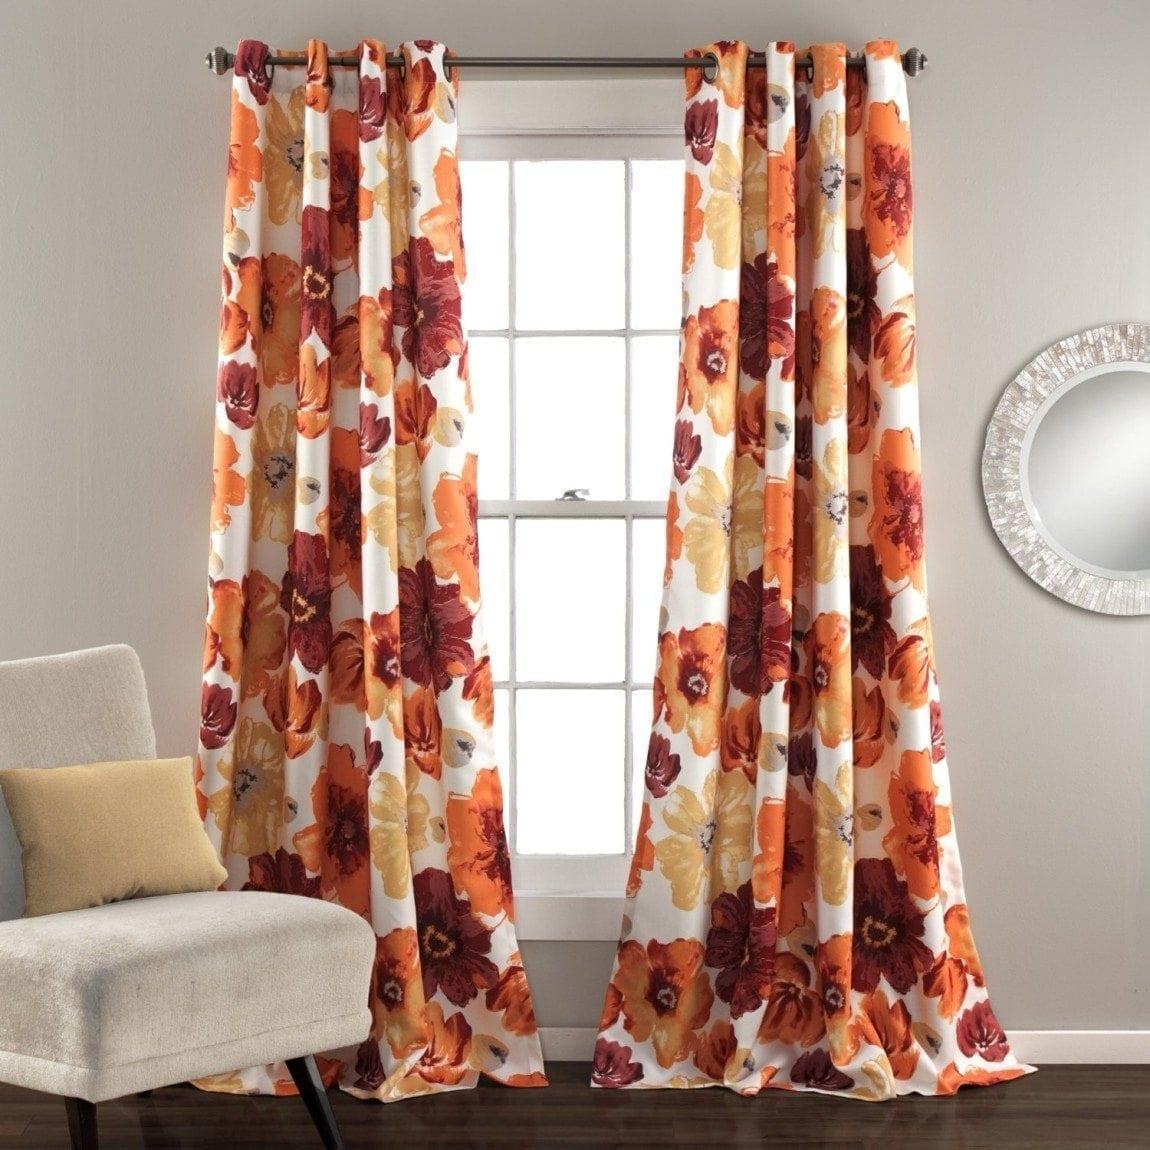 Lush Decor Leah Blackout Window Curtain Panel (Set of 2), Red:Orange